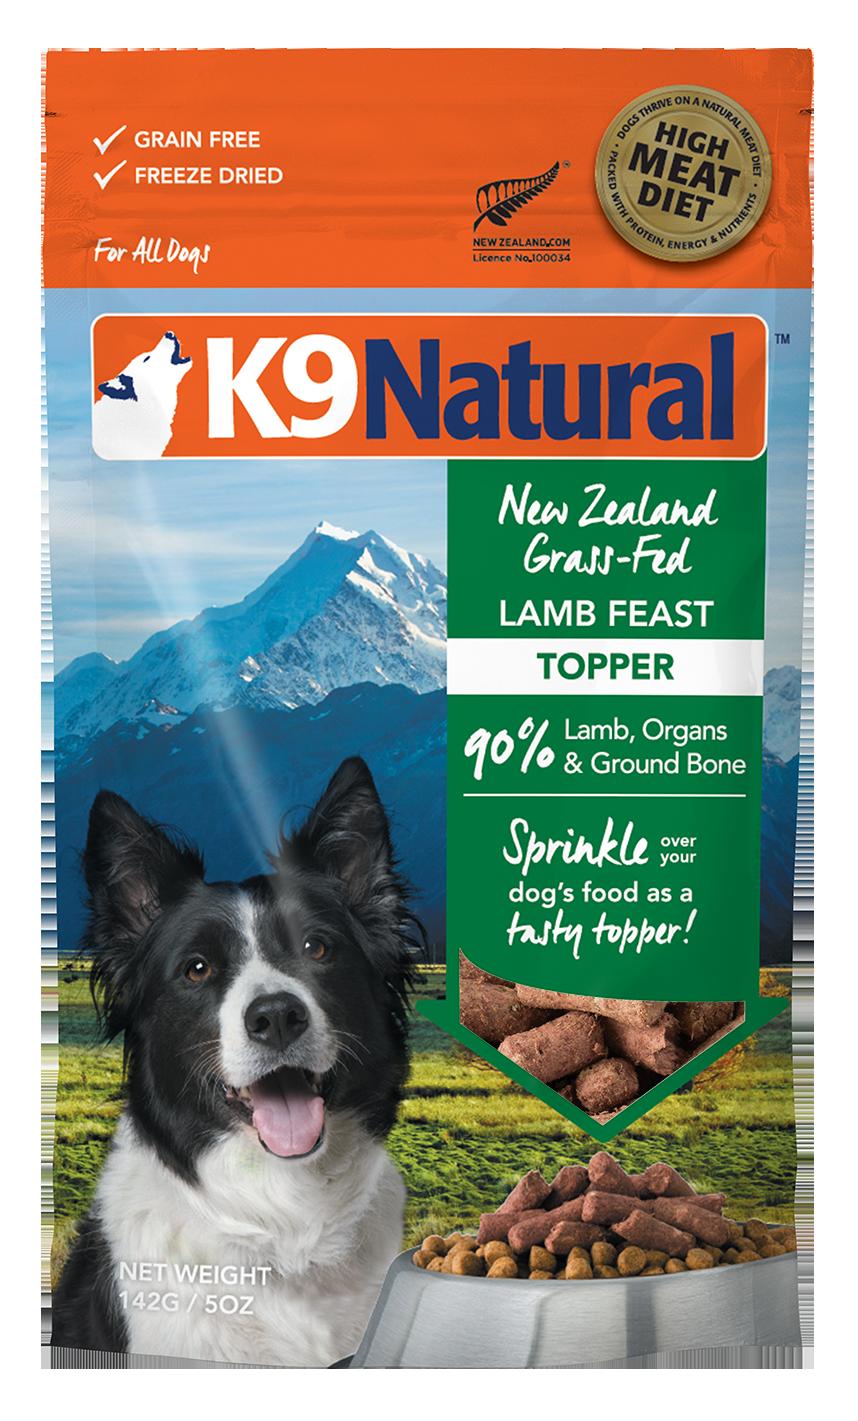 K9 Natural K9 Natural Freeze Dried Lamb Feast Dog Food Topper 5oz